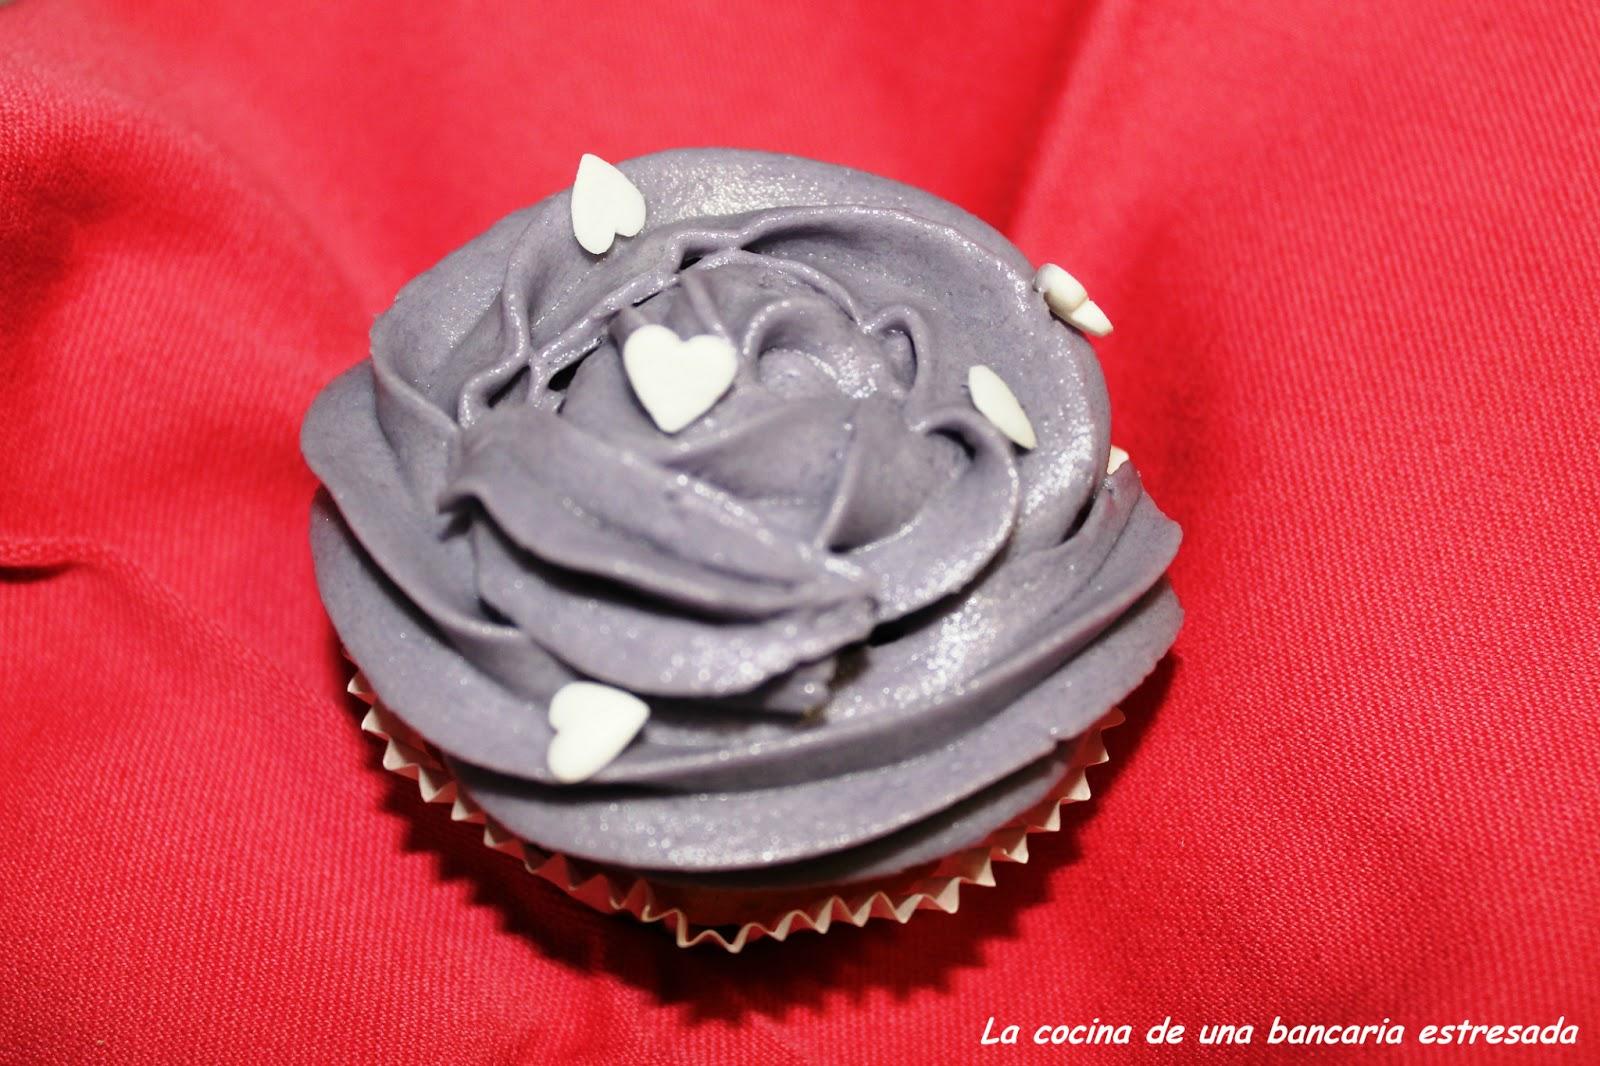 Muffins de chocolate con buttercream de vainilla